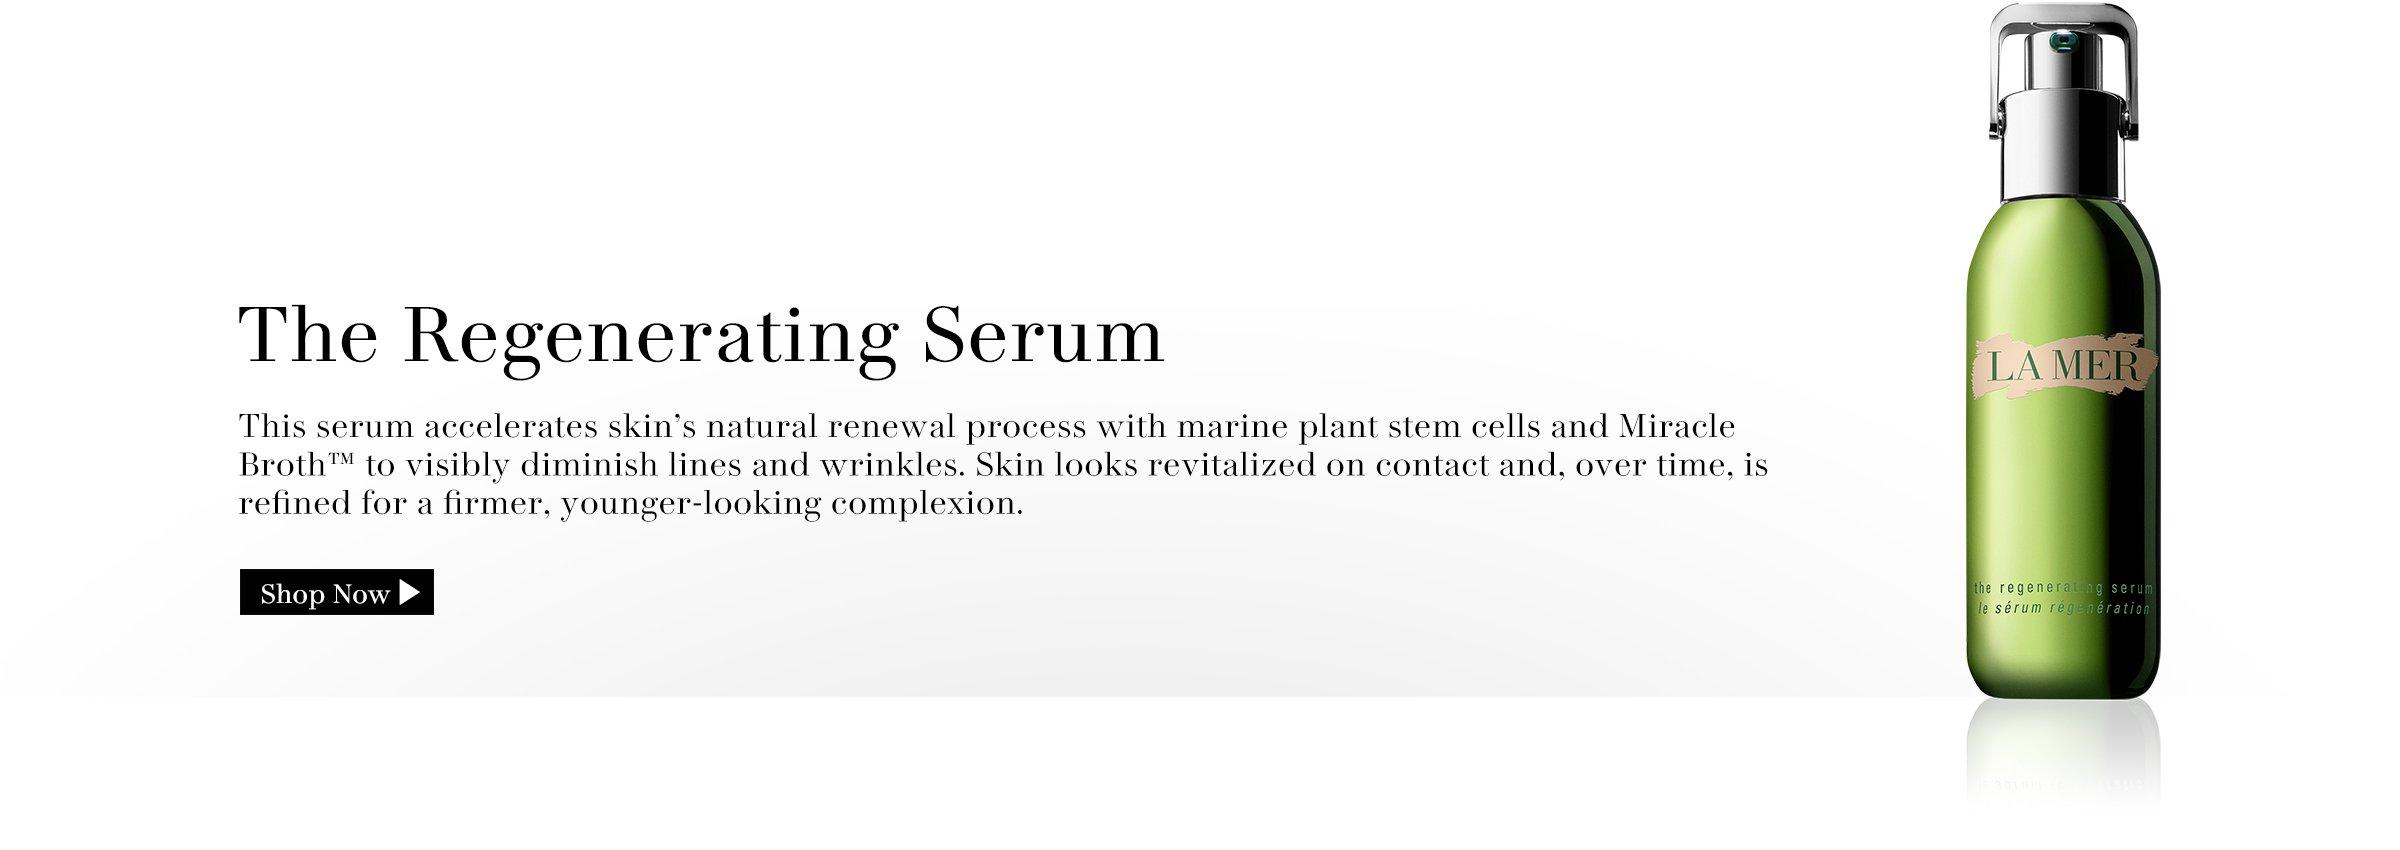 La Mer - The Regenerating Serum